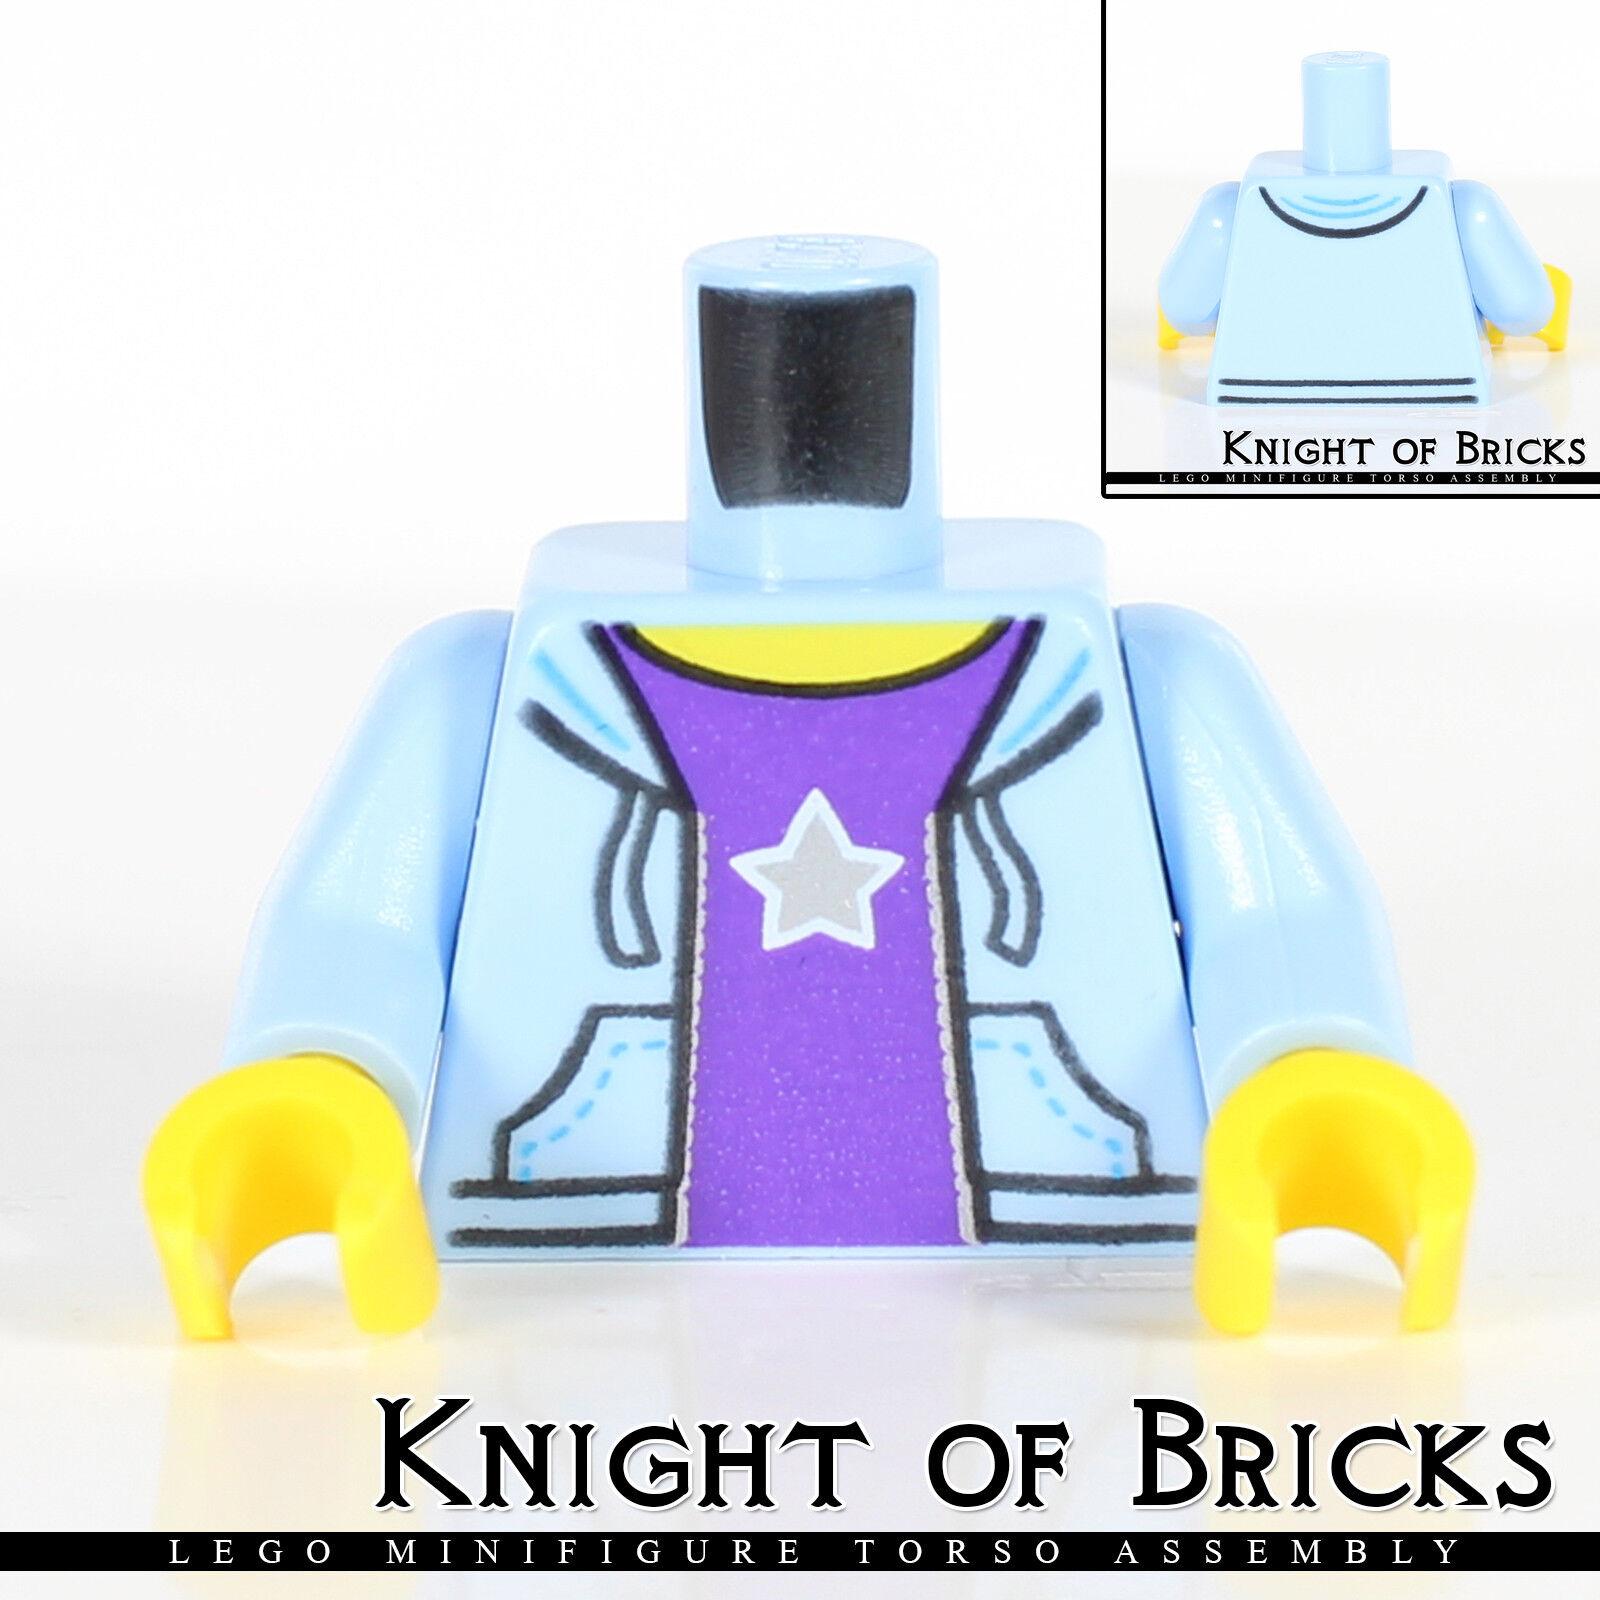 Lego NEW Minifigure Female Torso Hooded Sweatshirt Light Blue Purple Star Shirt